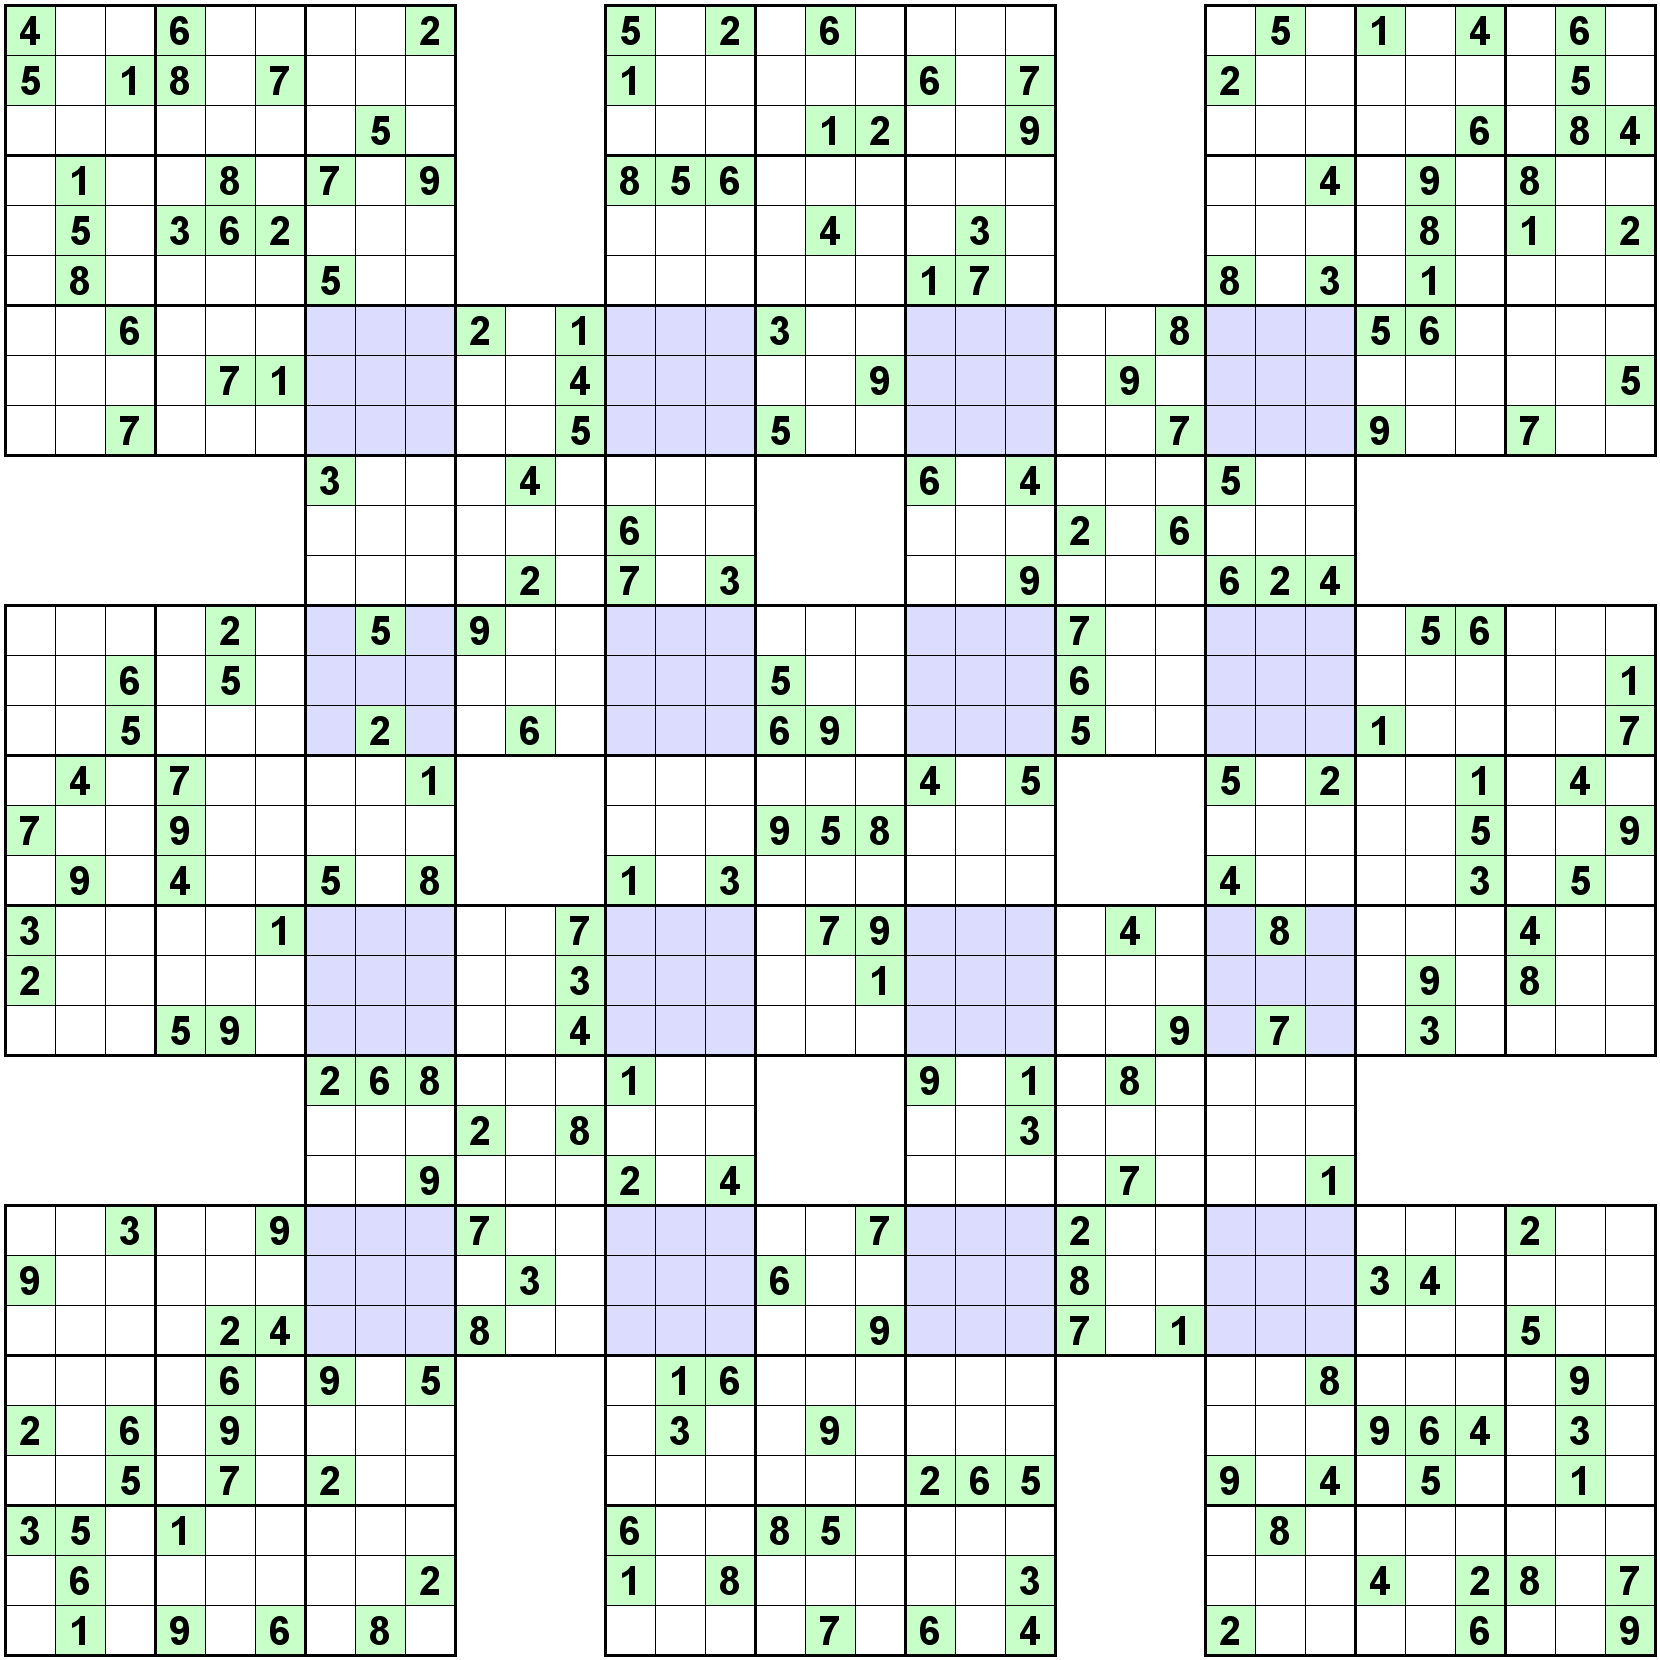 Number Logic Puzzle 7307 Sudoku Sudoku Printable Sudoku Puzzles